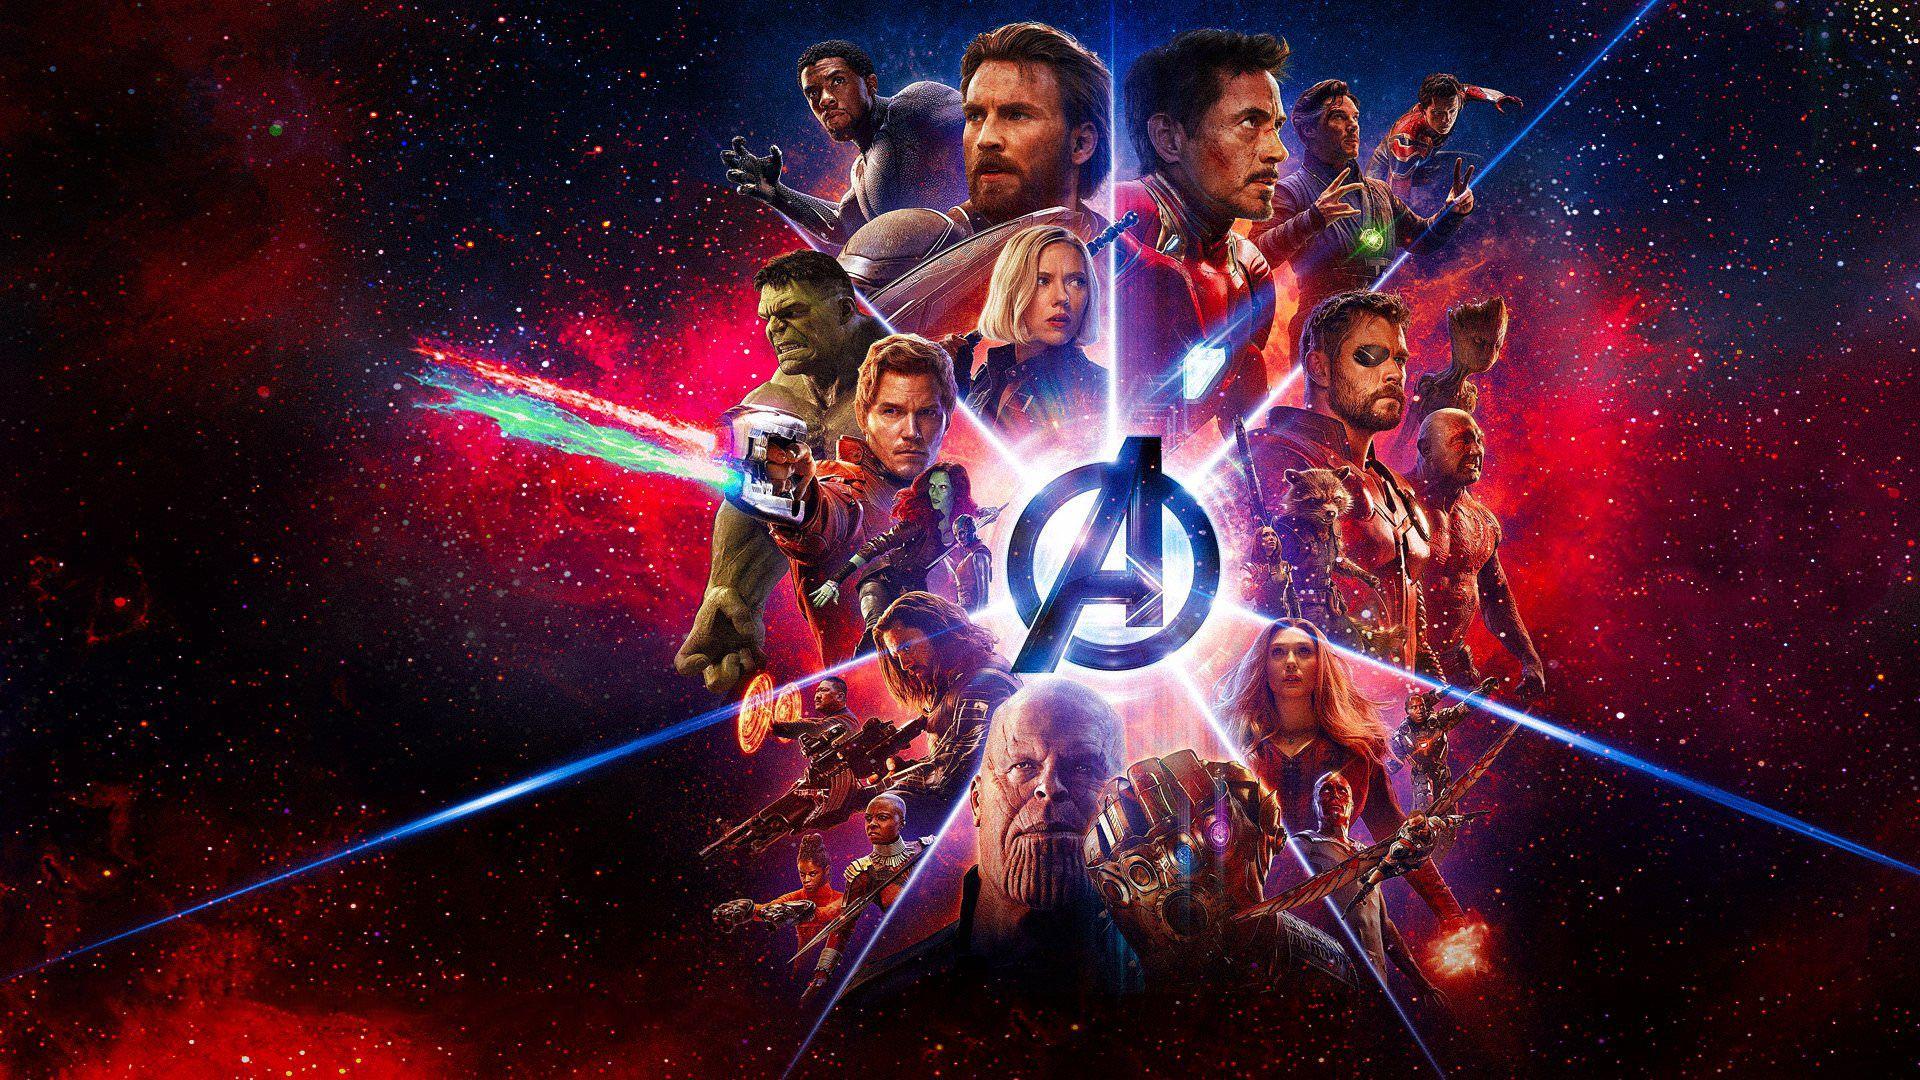 Avengers Infinity War Http Www Pixel4k Com Avengers Infinity War 23361 Html Avengers Infinity Man War Avengers Avengers Infinity War Infinity War